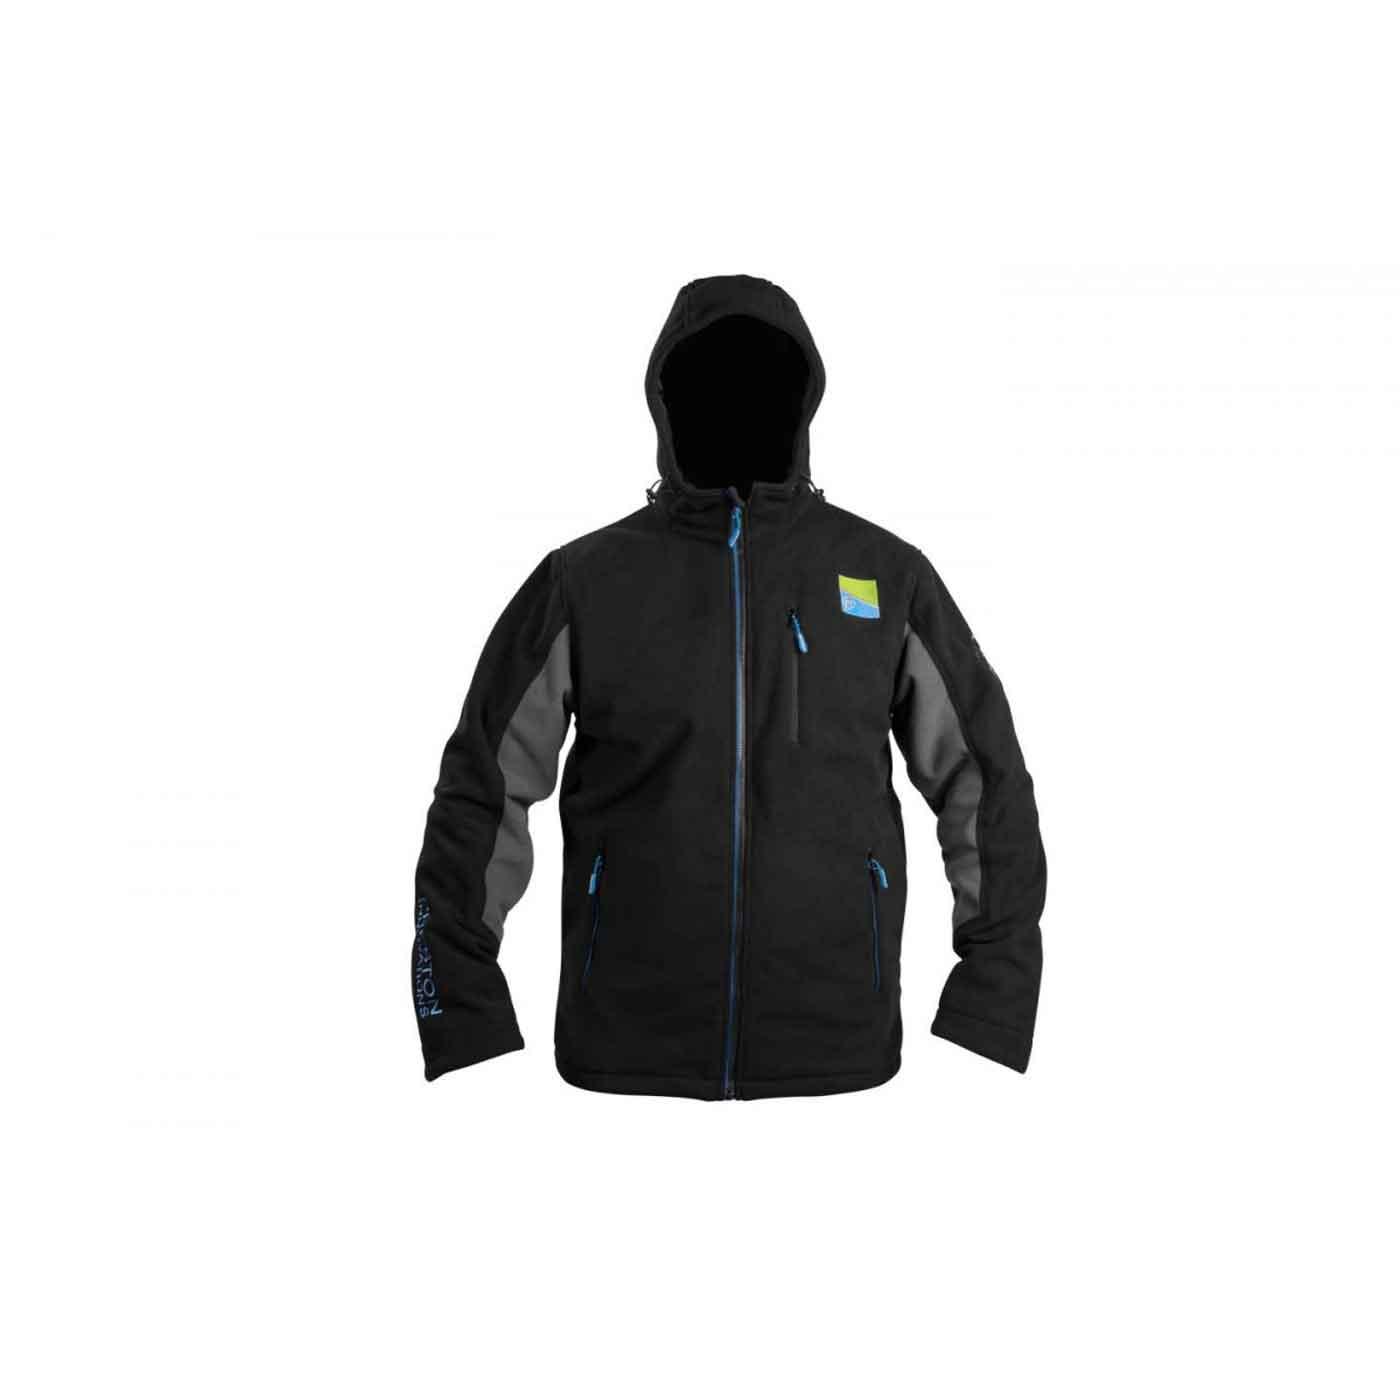 Preston Innovations Windproof Hooded Fleece Jacket